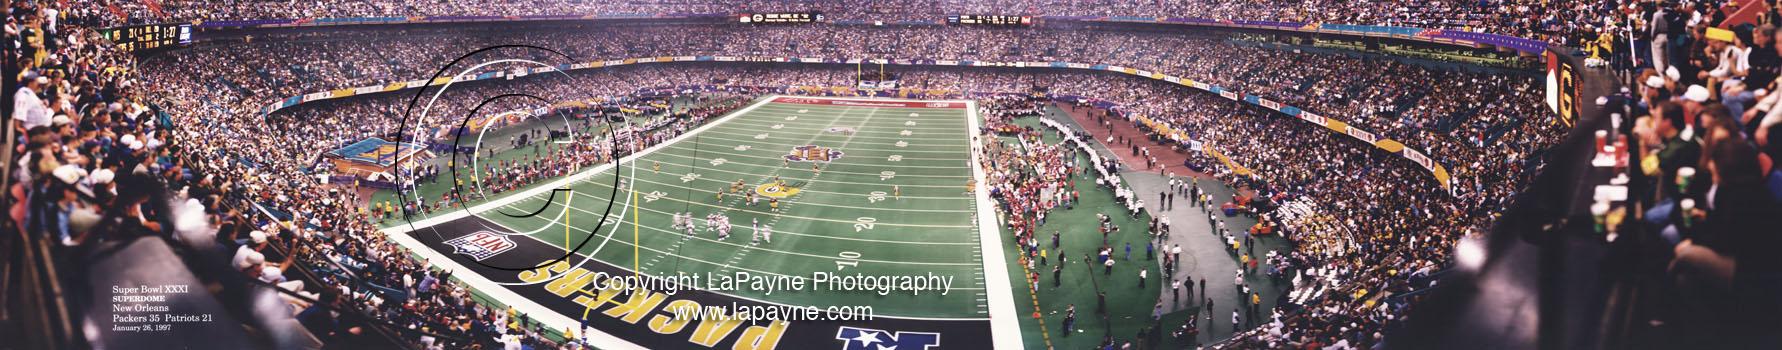 SP_NFL_018_LG.jpg